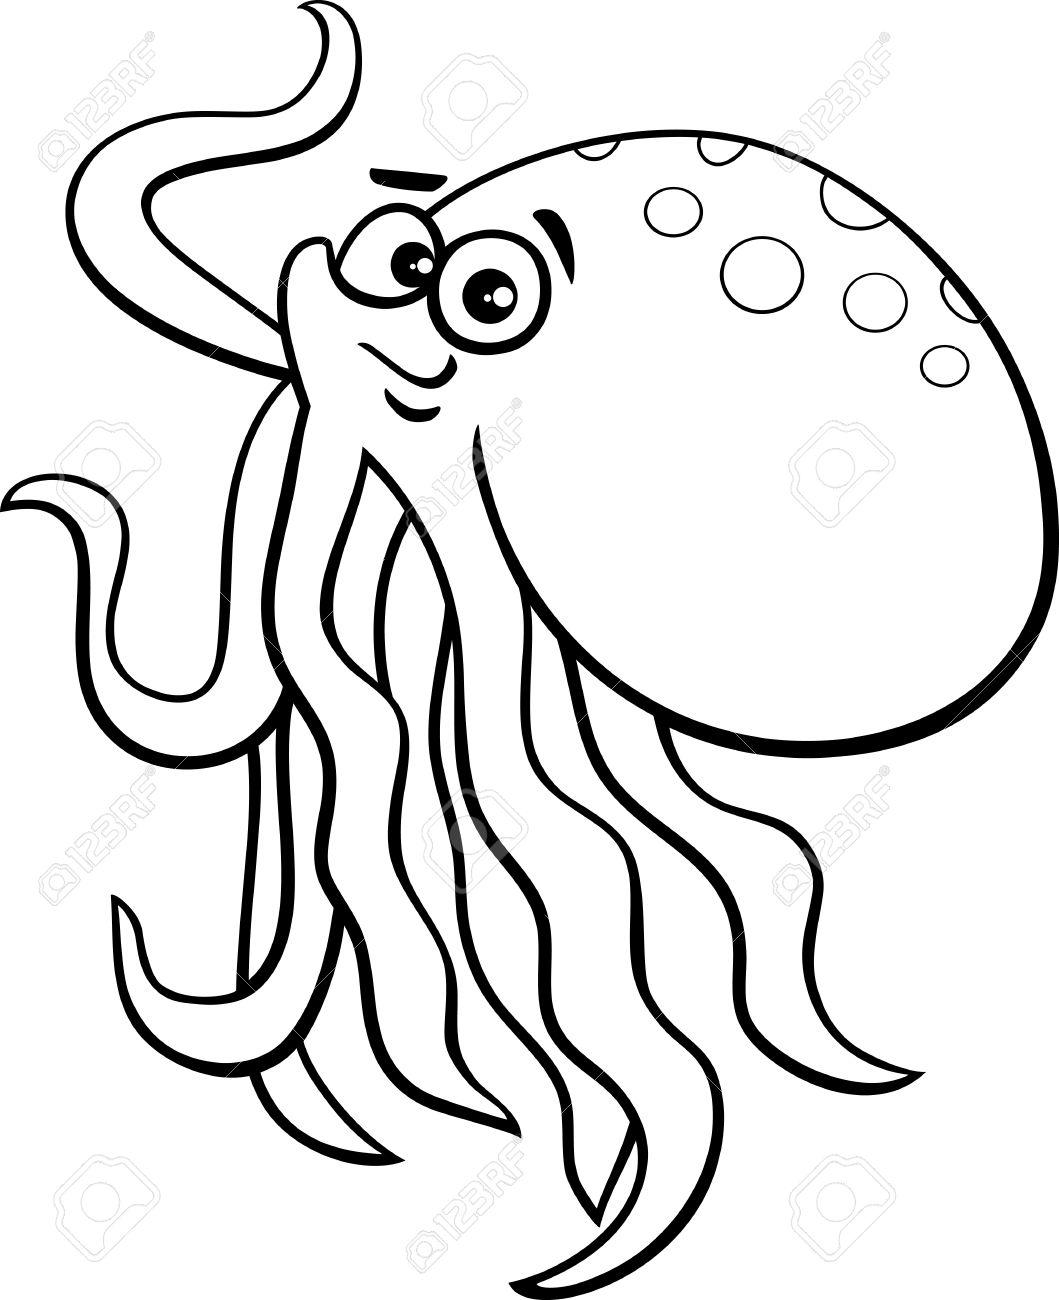 Black And White Cartoon Illustration Of Cute Octopus Sea Animal.